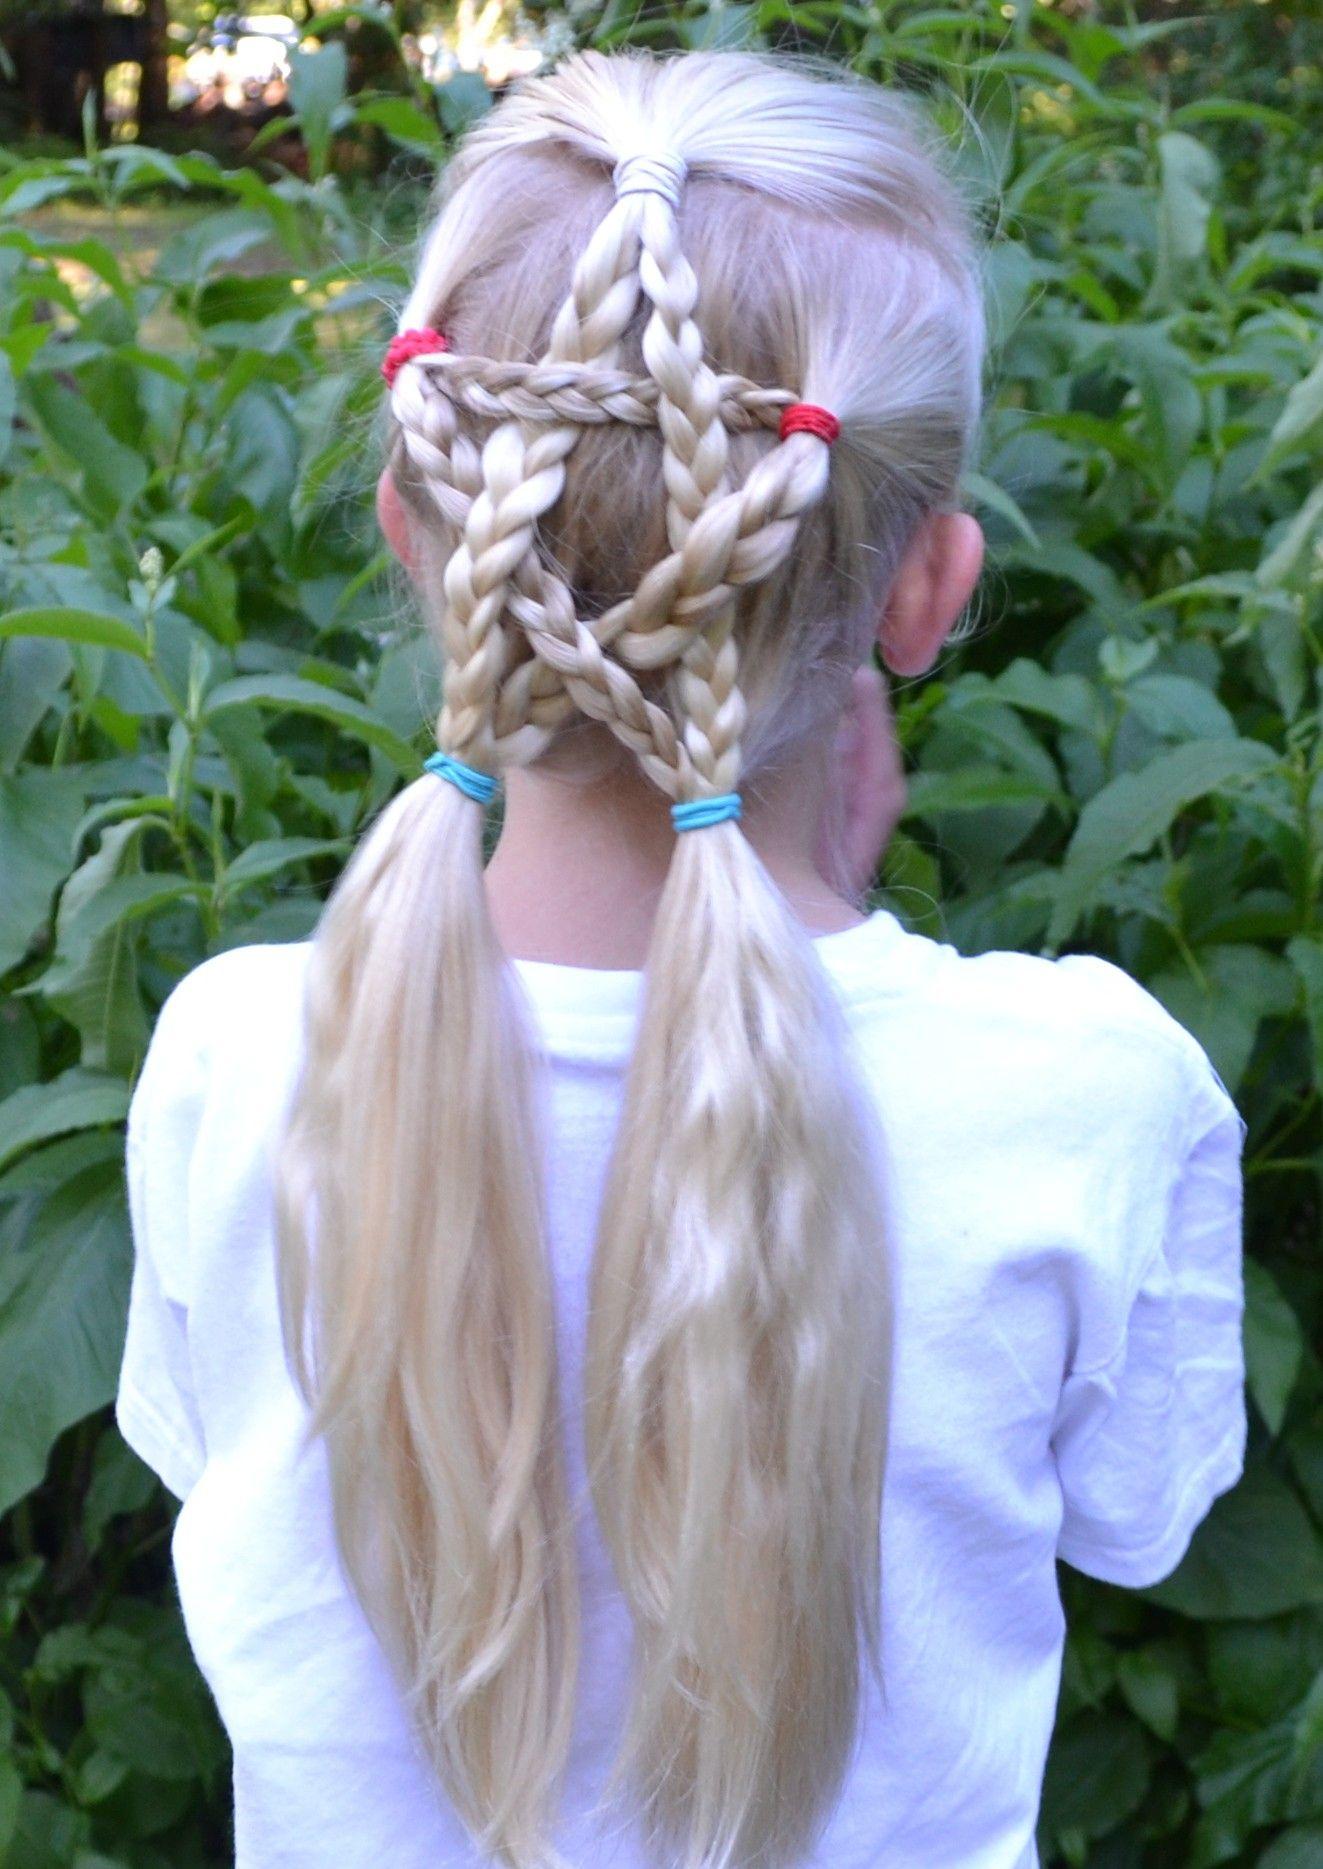 star braid - Google Search | Braided hairstyles, Hair styles ...